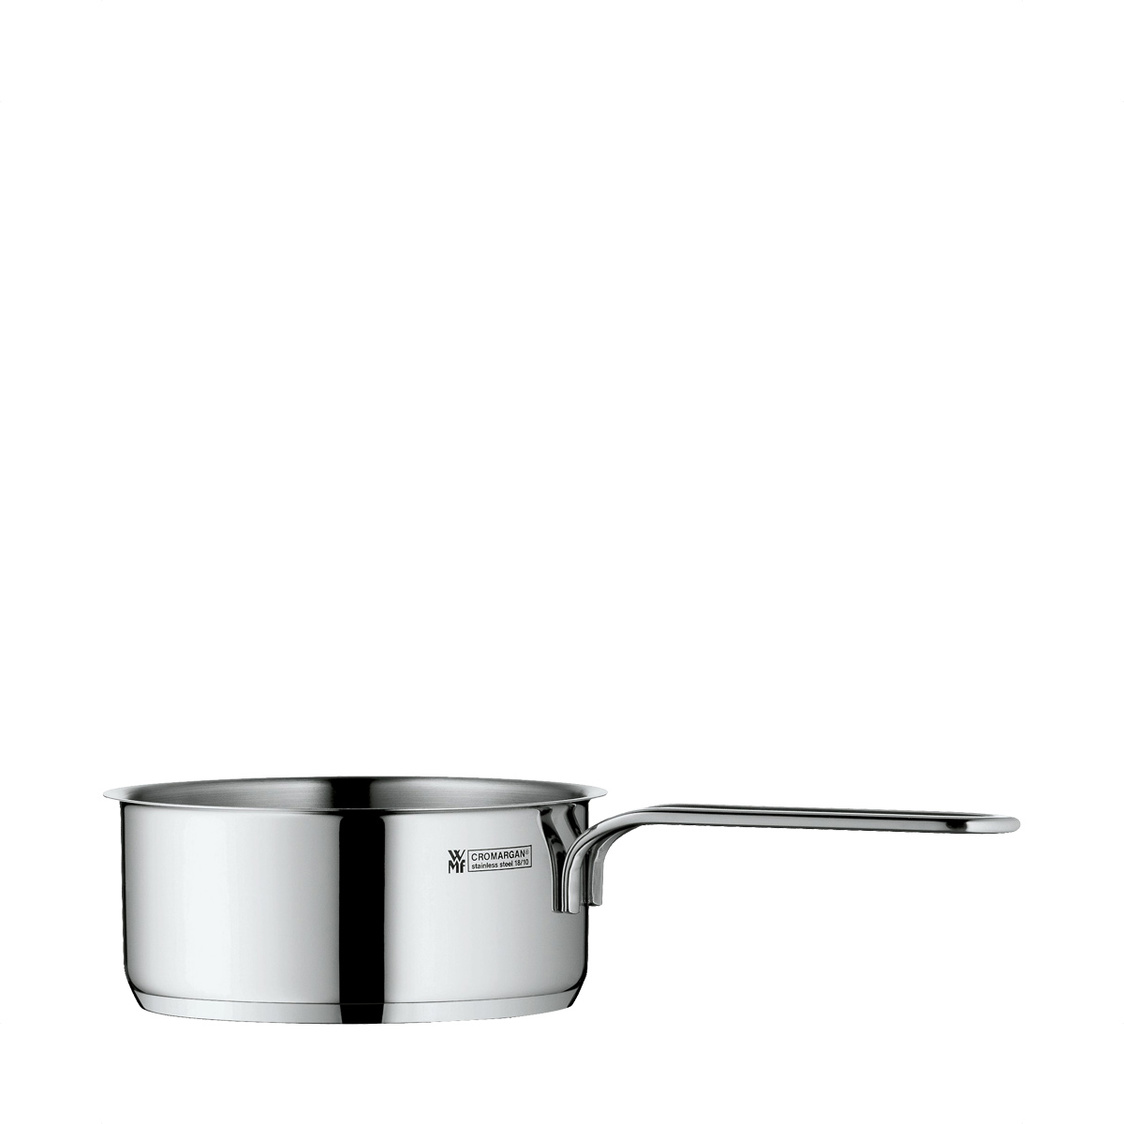 WMF Mini Sortiment Saucepan 14cm